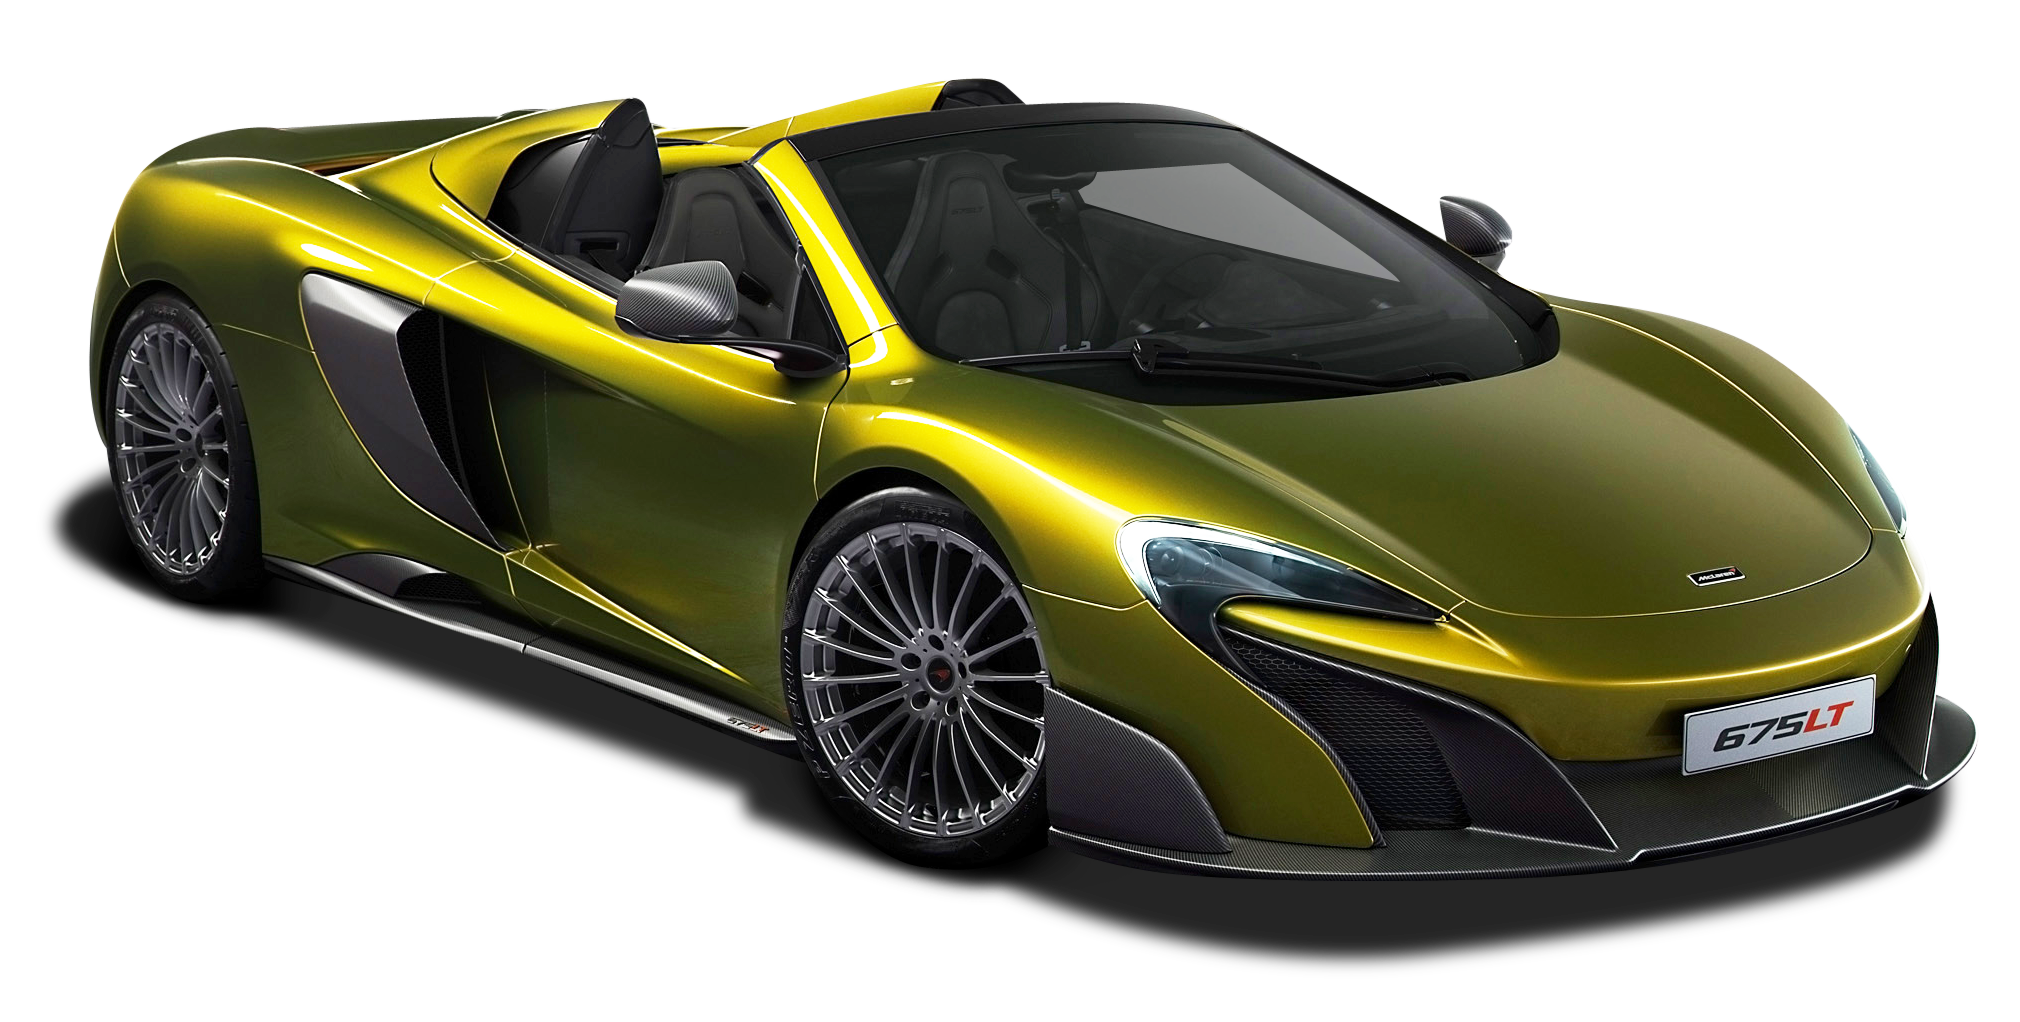 Green clipart sports car. Mclaren lt spider super